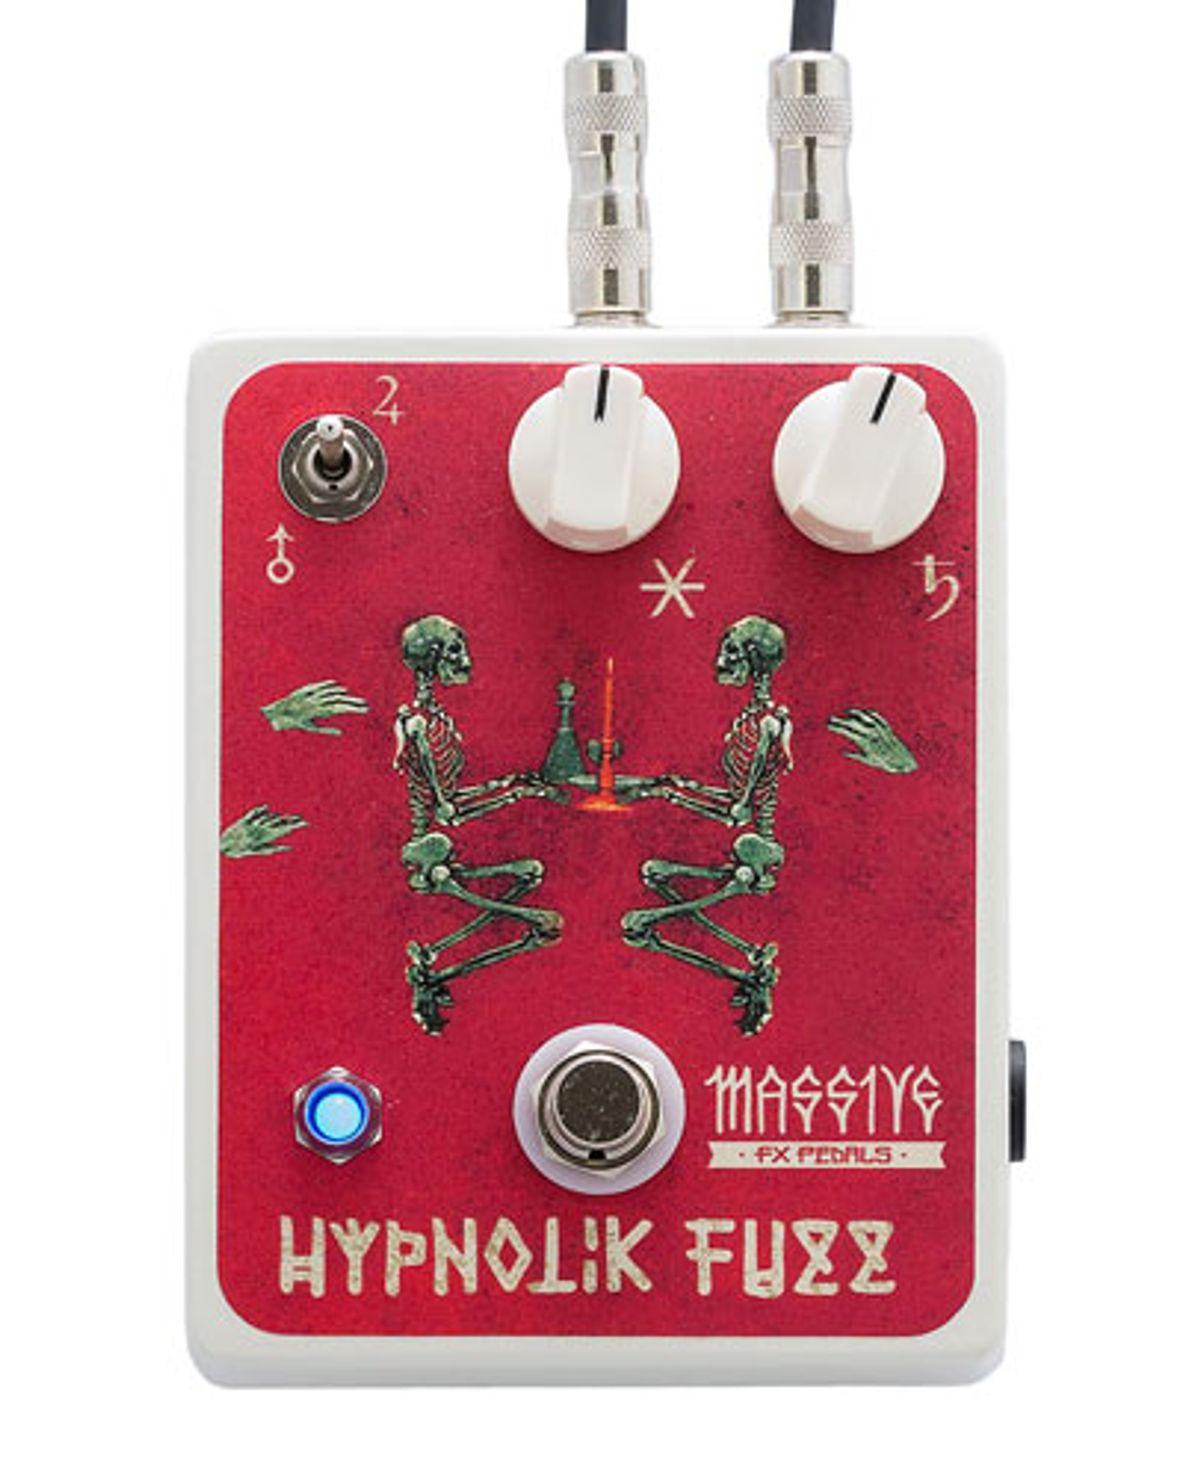 Massive FX Pedals Releases the Hypnotik Fuzz